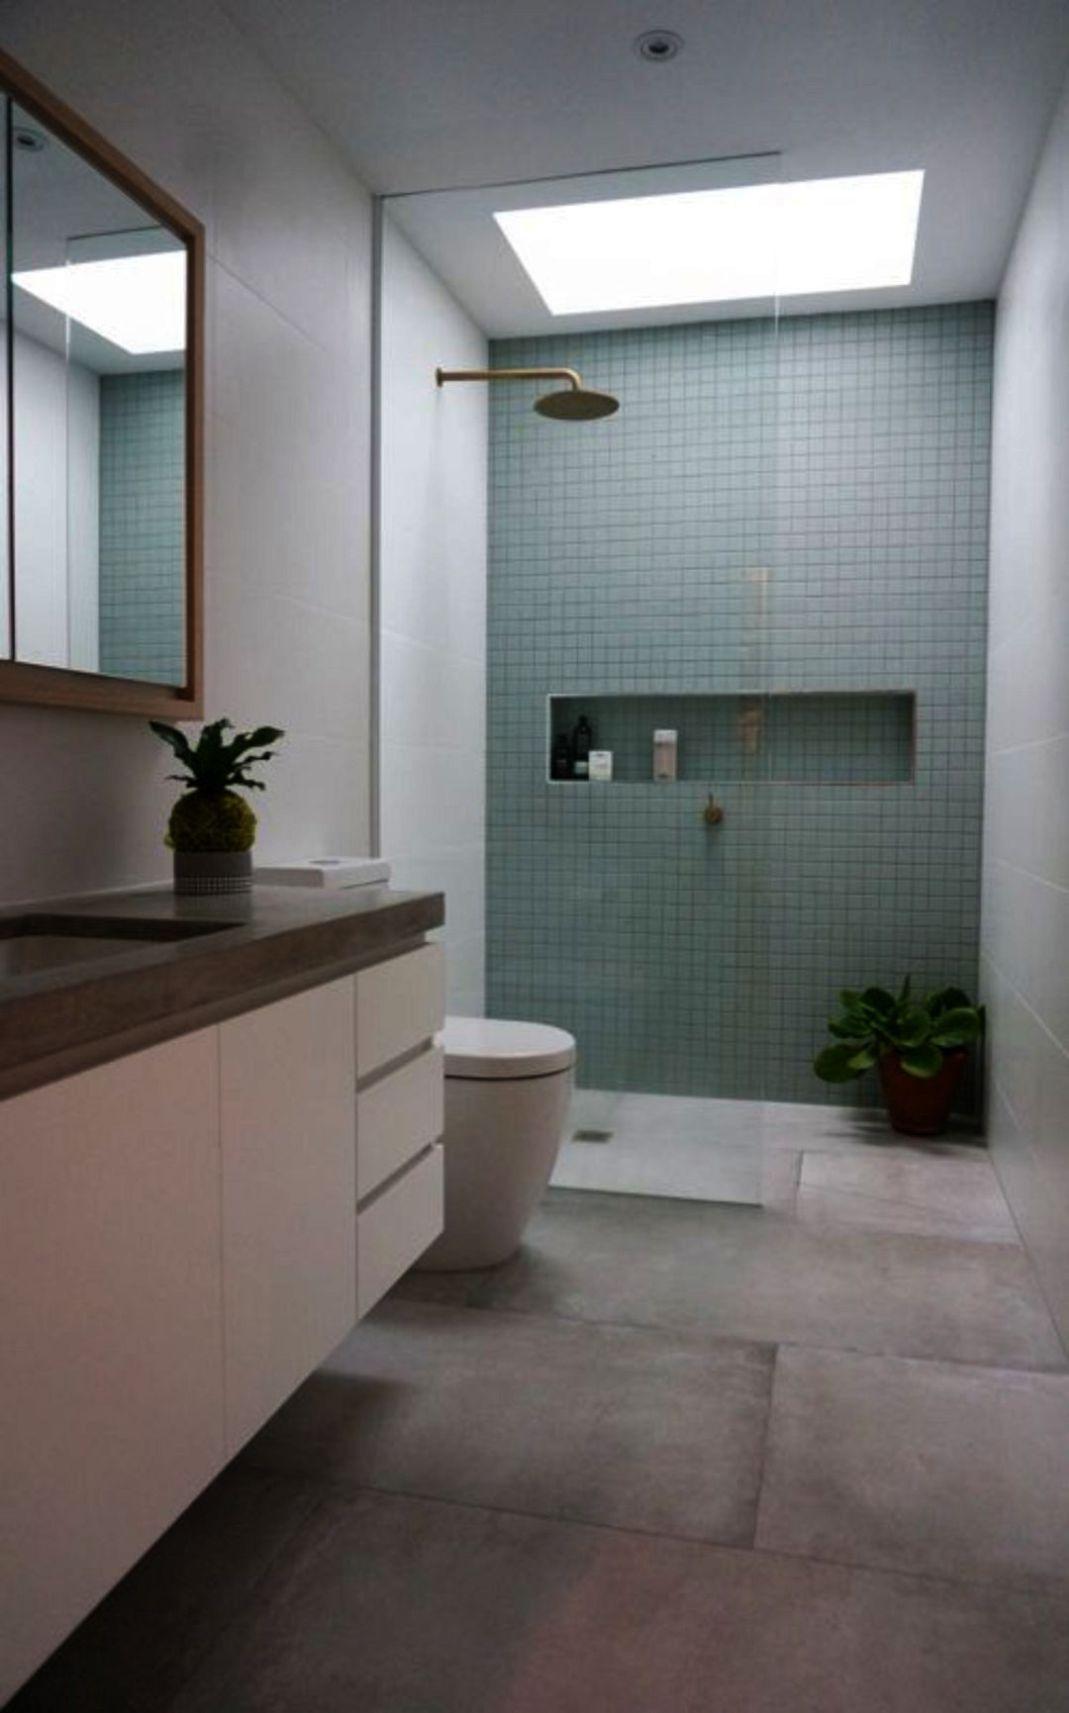 Small Bathroom Ideas Philippines Once Bathroom Decor Pictures Bathroom Ideas Trendy Bathroom Tiles Diy Bathroom Remodel Trendy Bathroom